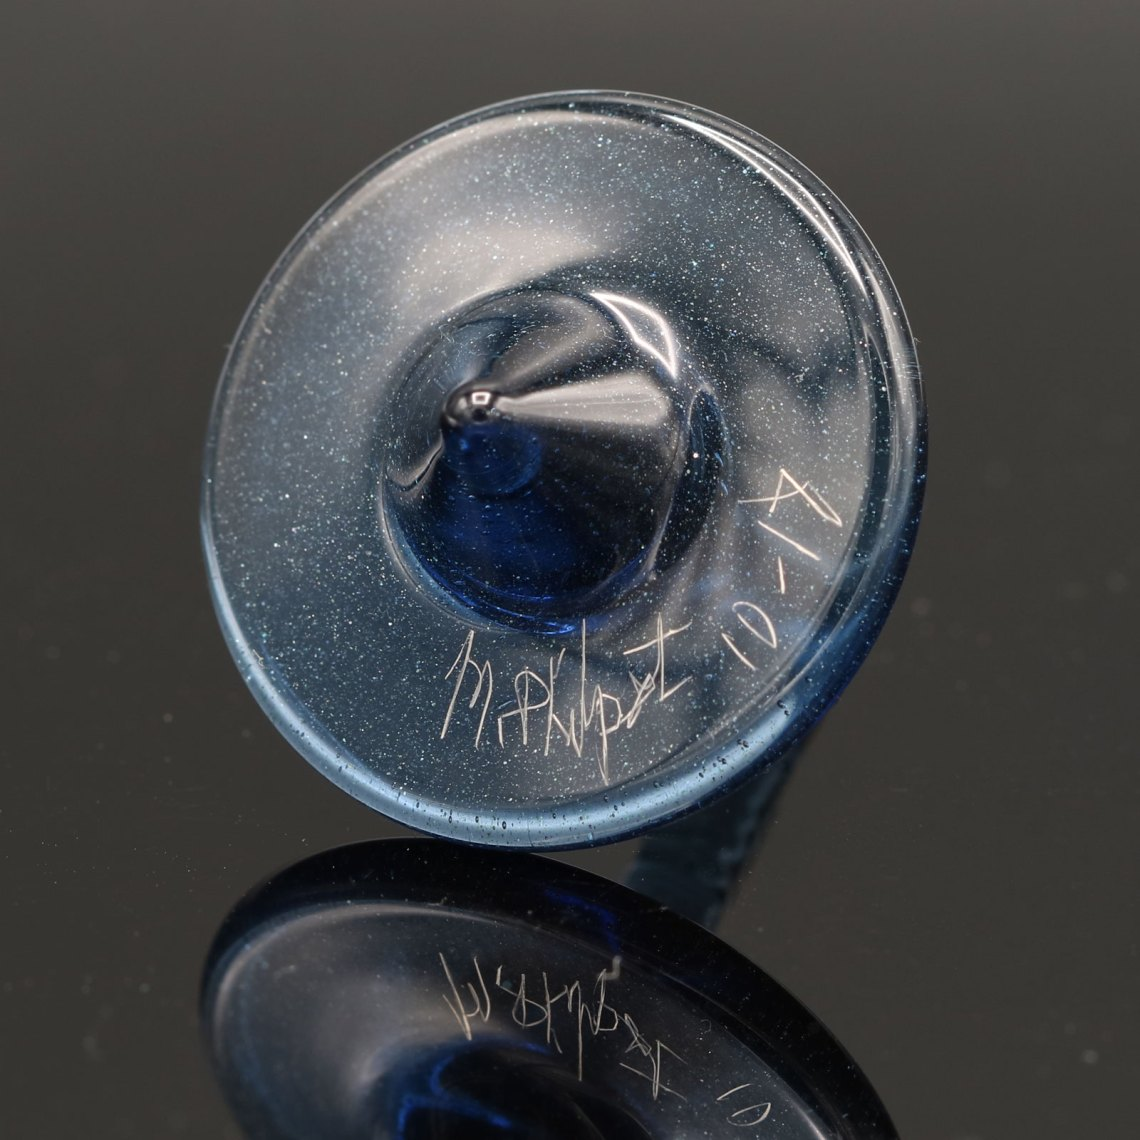 Mike Philpot – Blue Spinning Glass Top